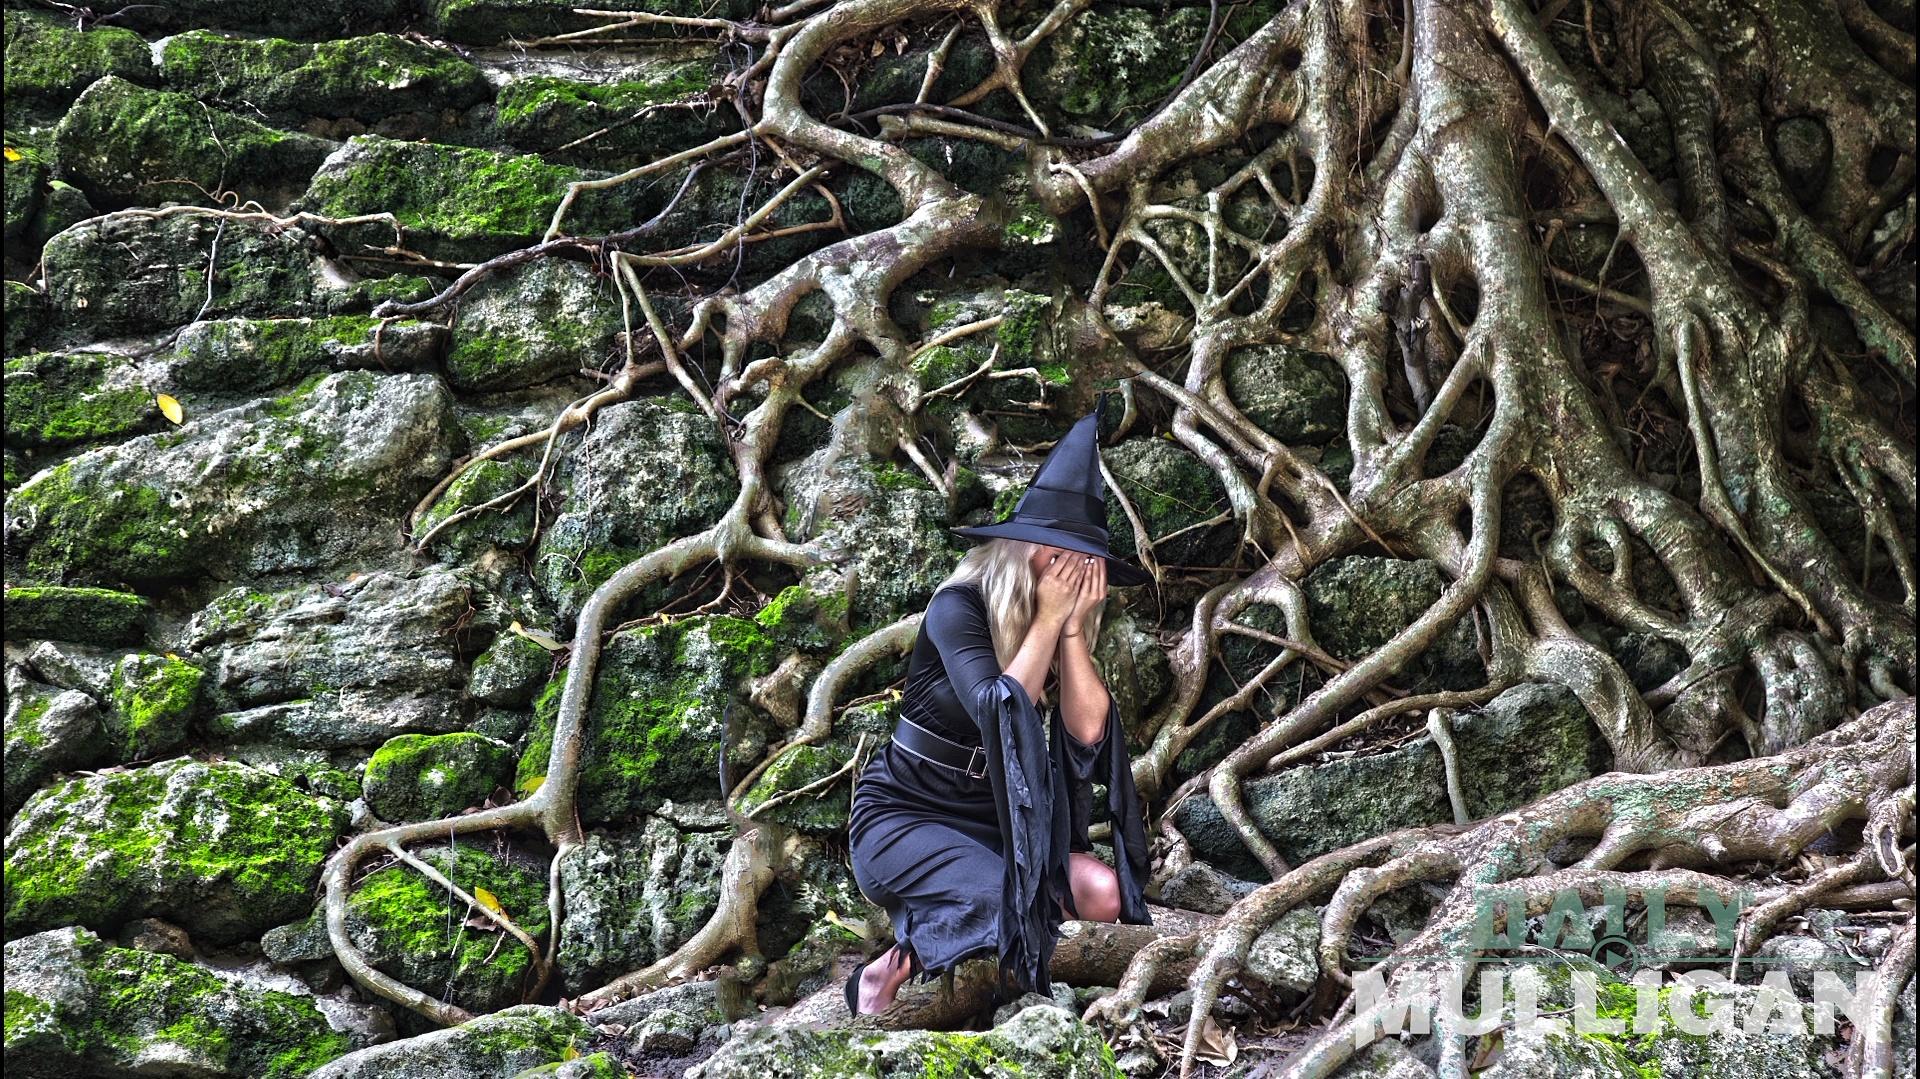 Palm Beach Urban Legend: The Curse of Witch's Rock